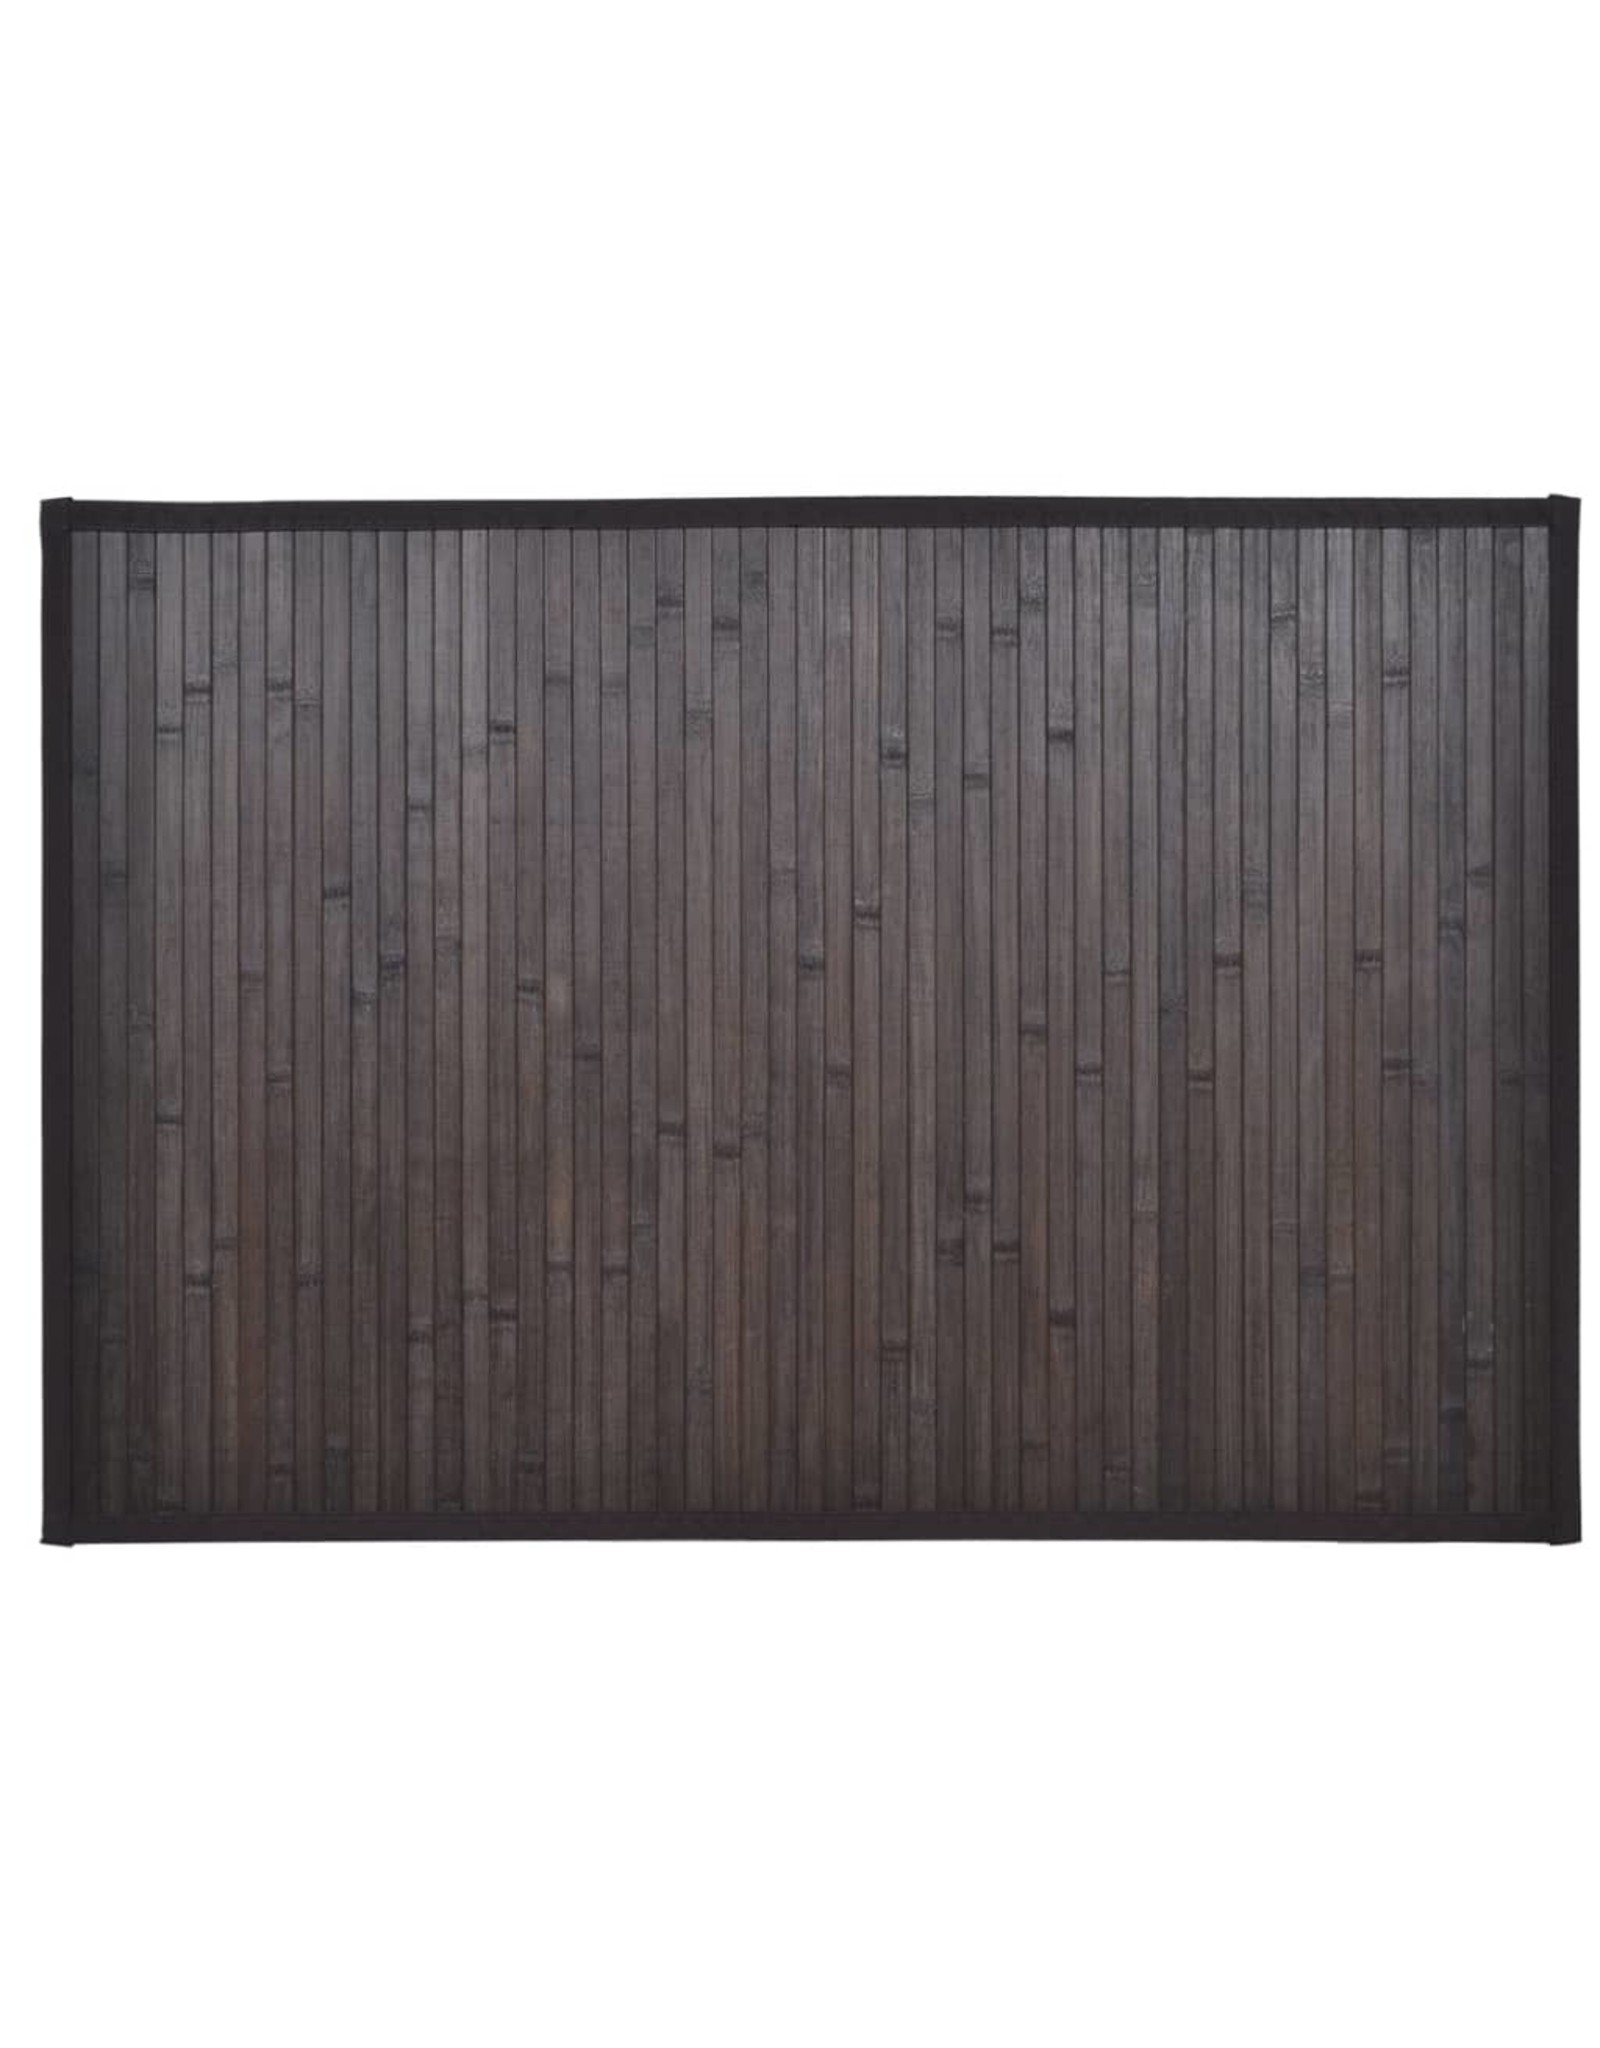 Badmatten 4 st 40x50 cm bamboe donkerbruin